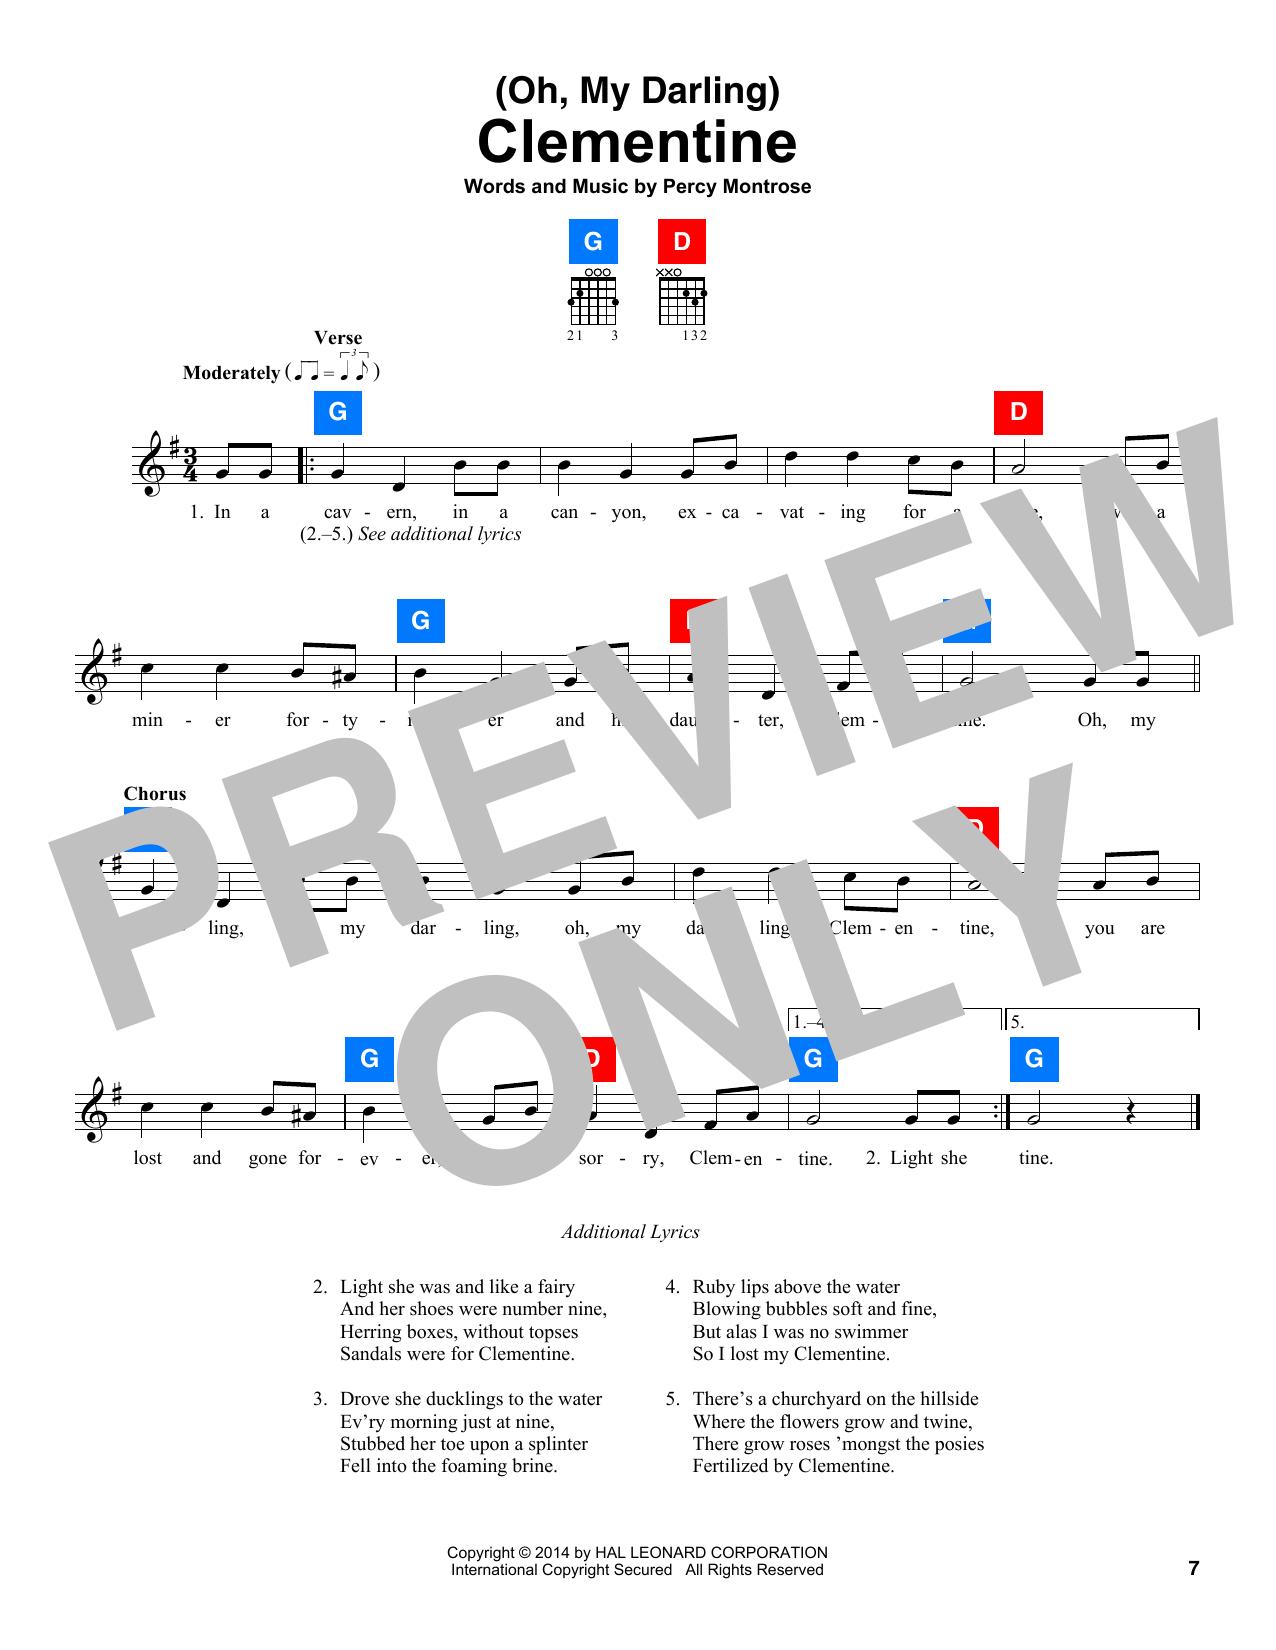 Sheet Music Digital Files To Print Licensed Percy Montrose Digital